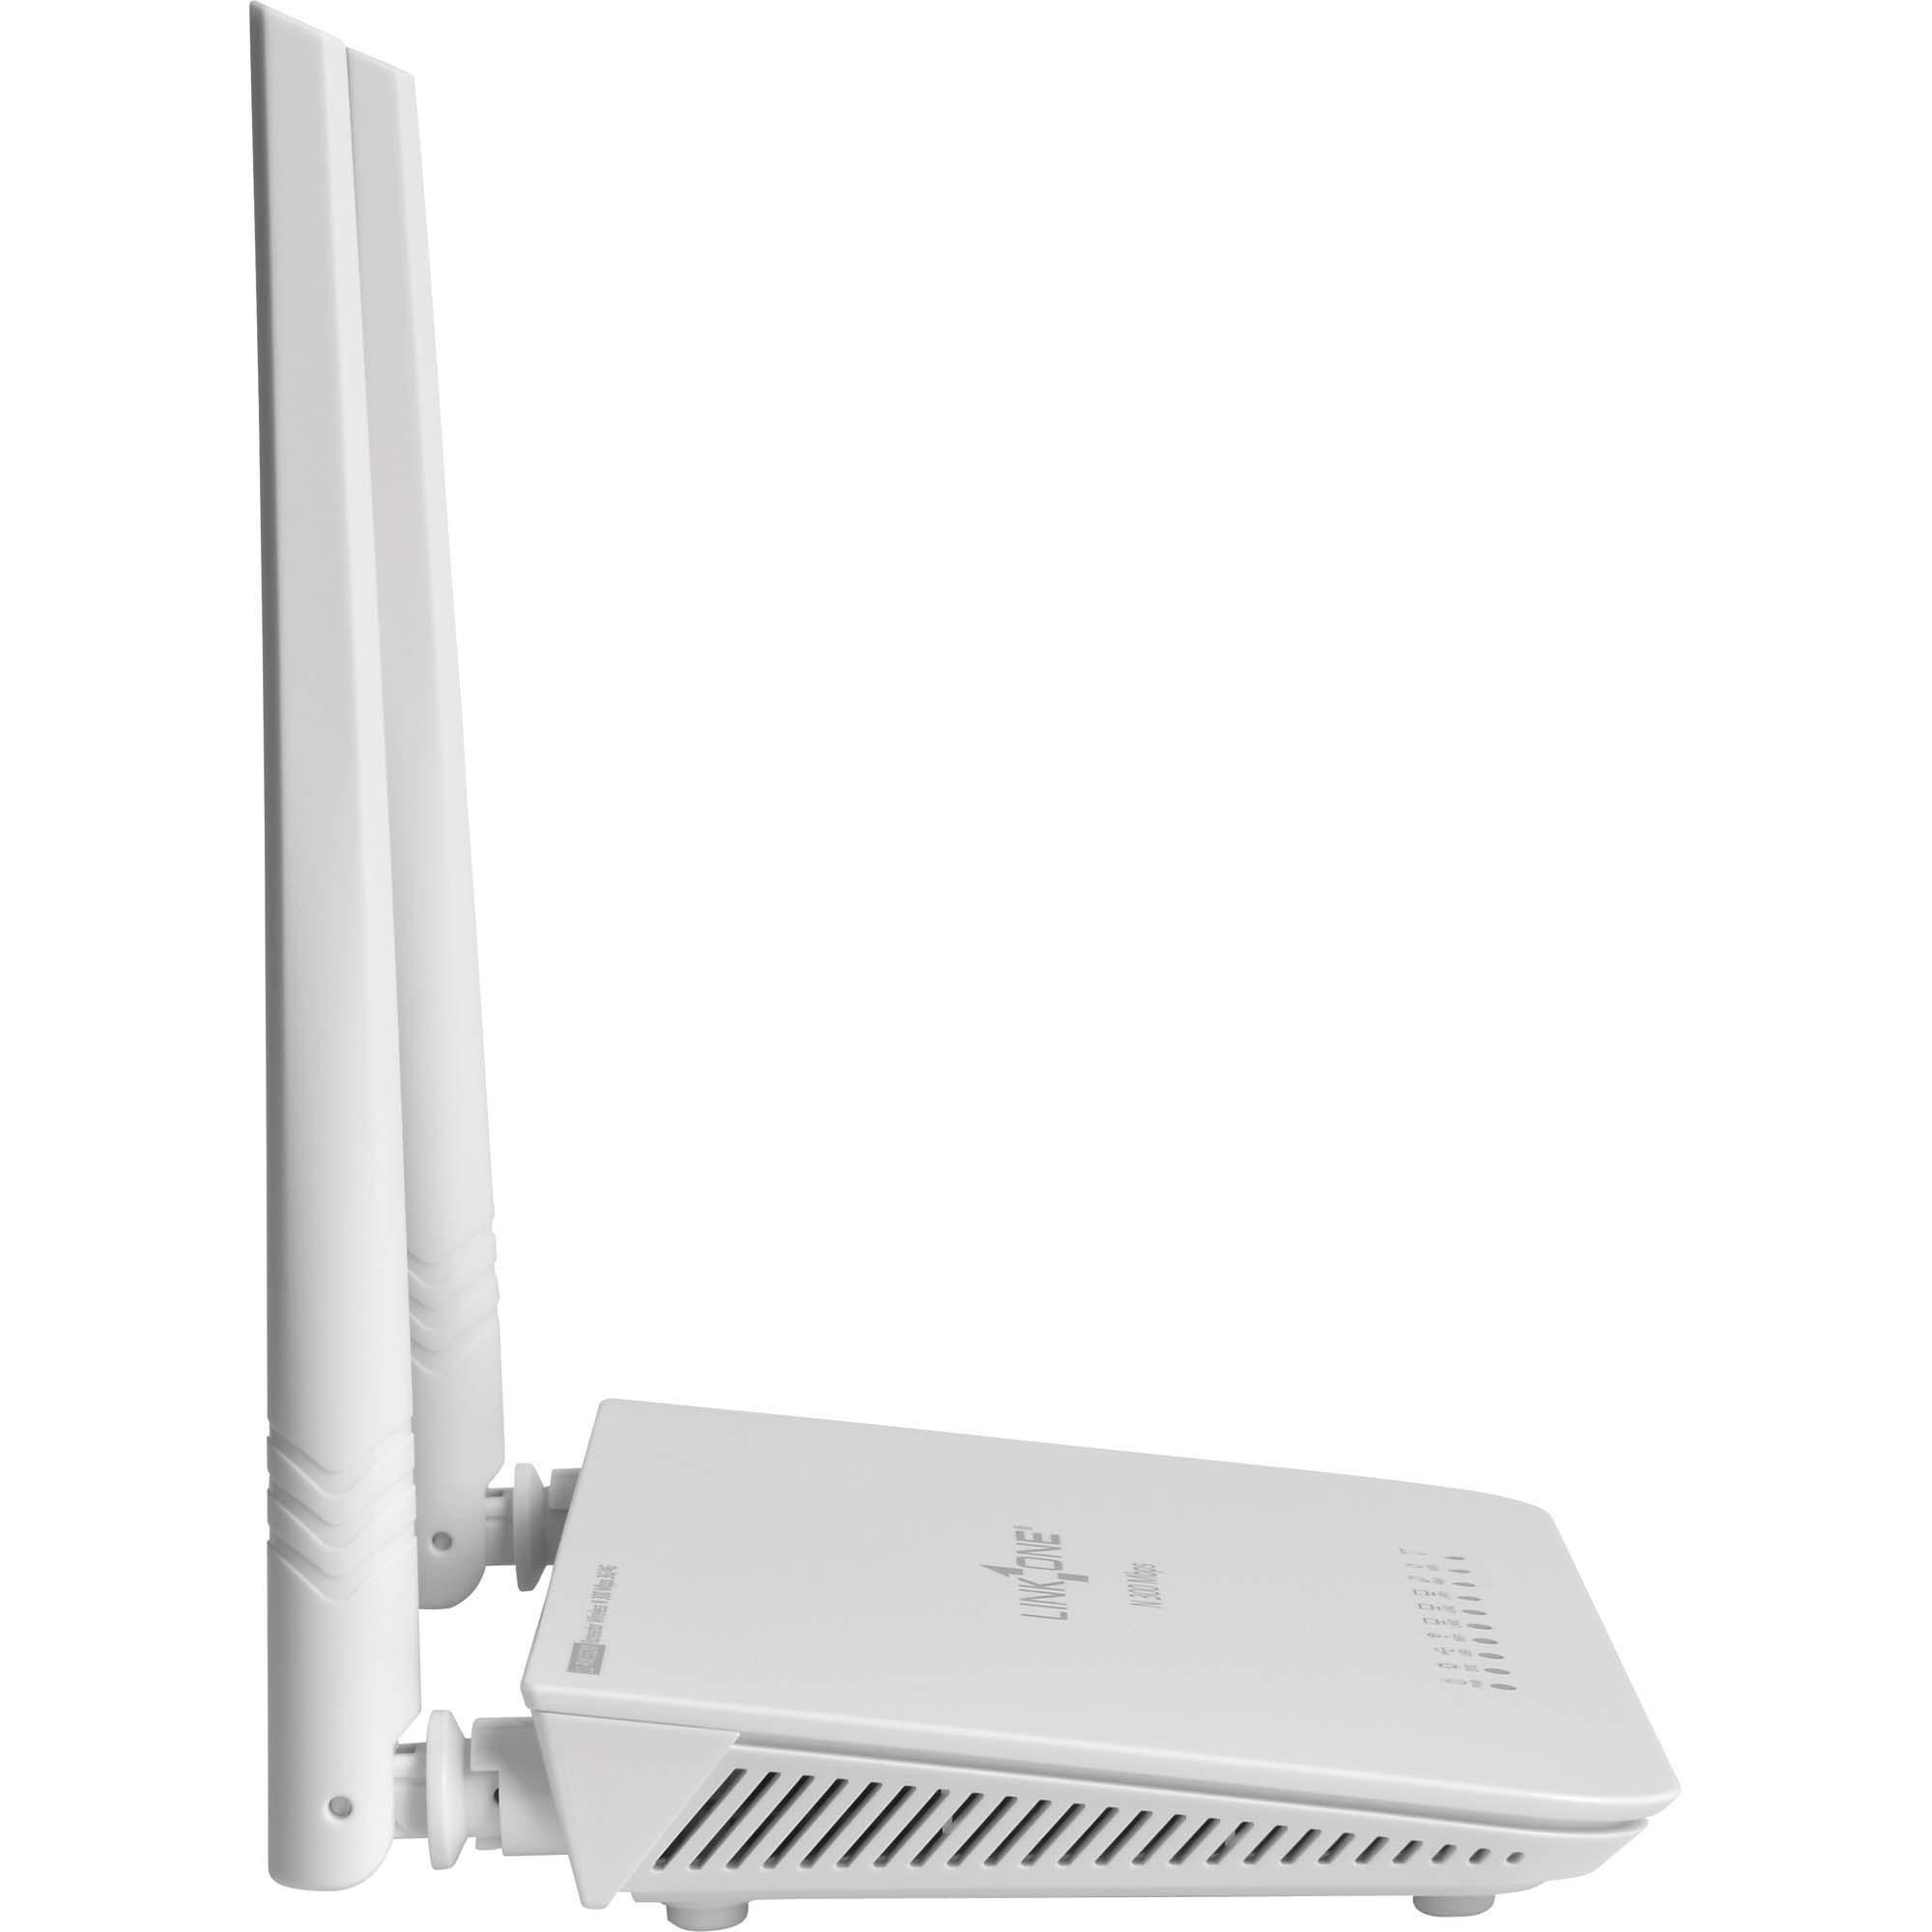 Roteador Wireless 300Mbps 2 Antenas 5dbi Link One RW332M 3G/4G